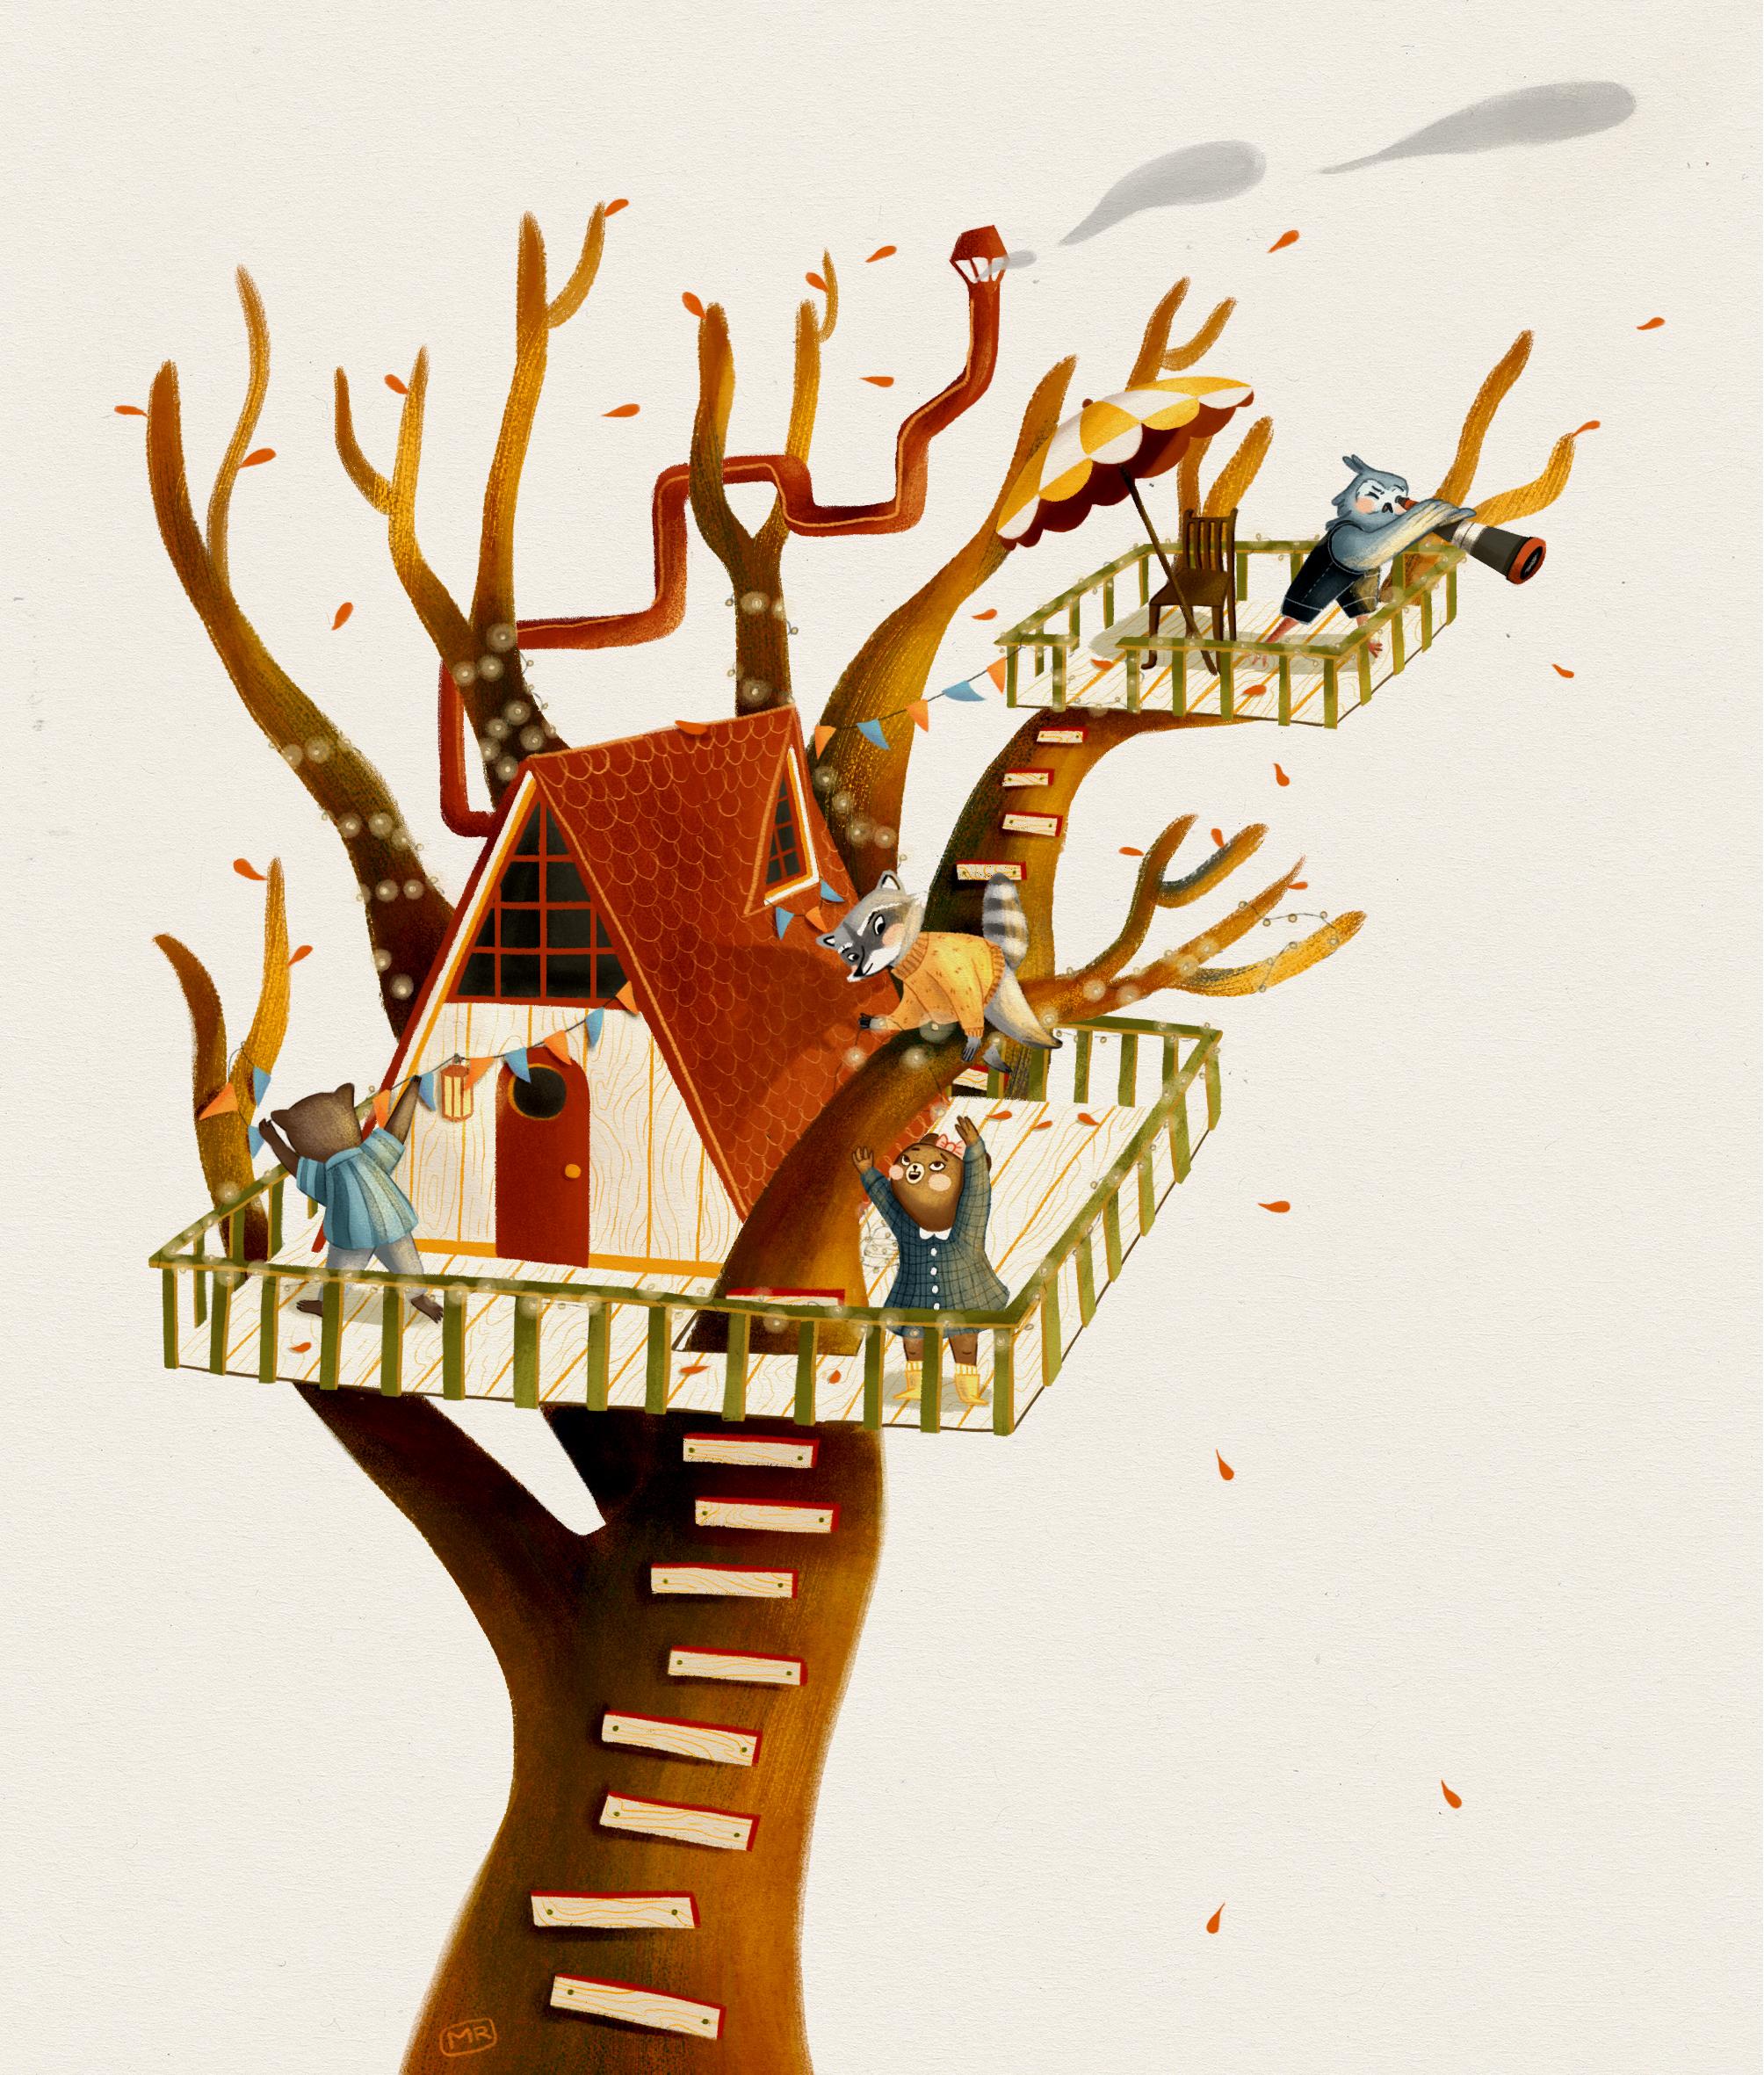 Tree House_JuliaCastaño.jpg